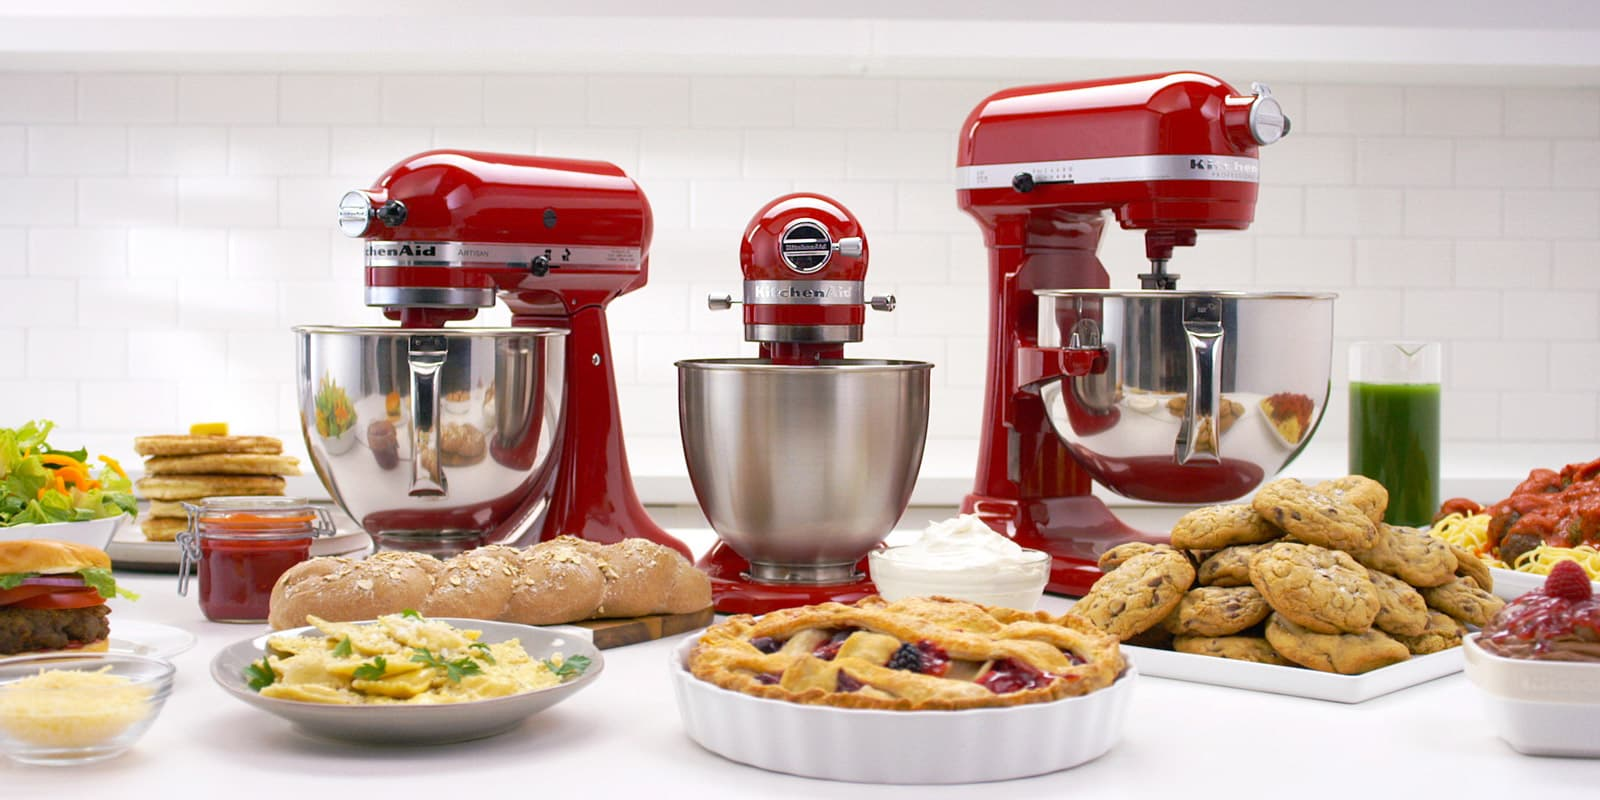 4.8 L KitchenAid ARTISAN Stand Mixer 5KSM175PS | Official ...